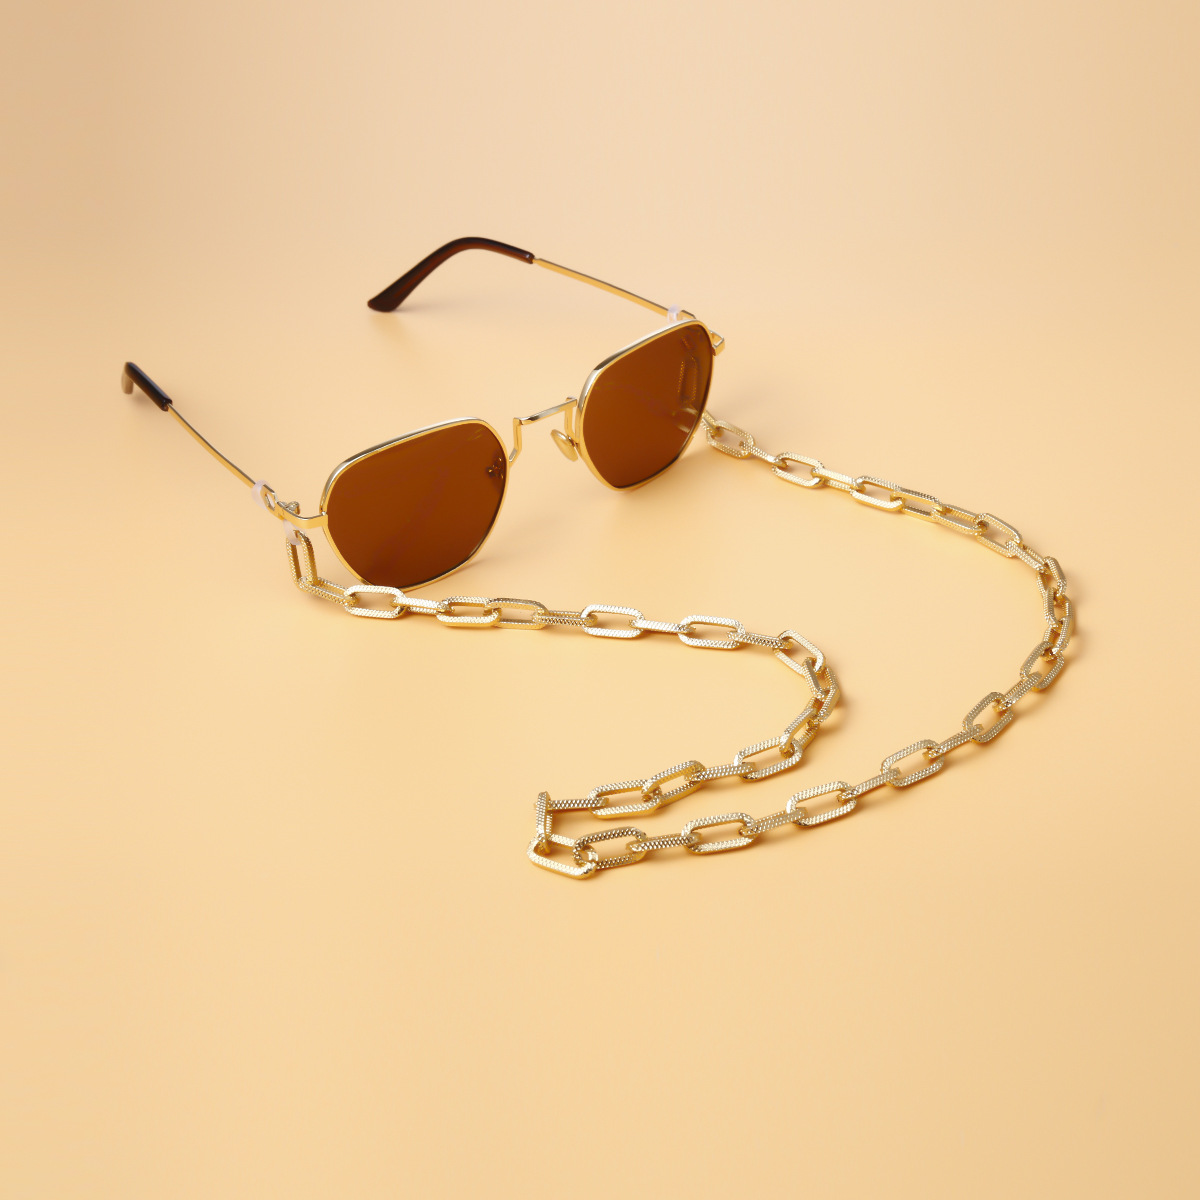 Retro Geometric Tassel Women Men Sunglasses Accessories Eyeglasses Holder Cross Chains Glasses Chain Lanyard